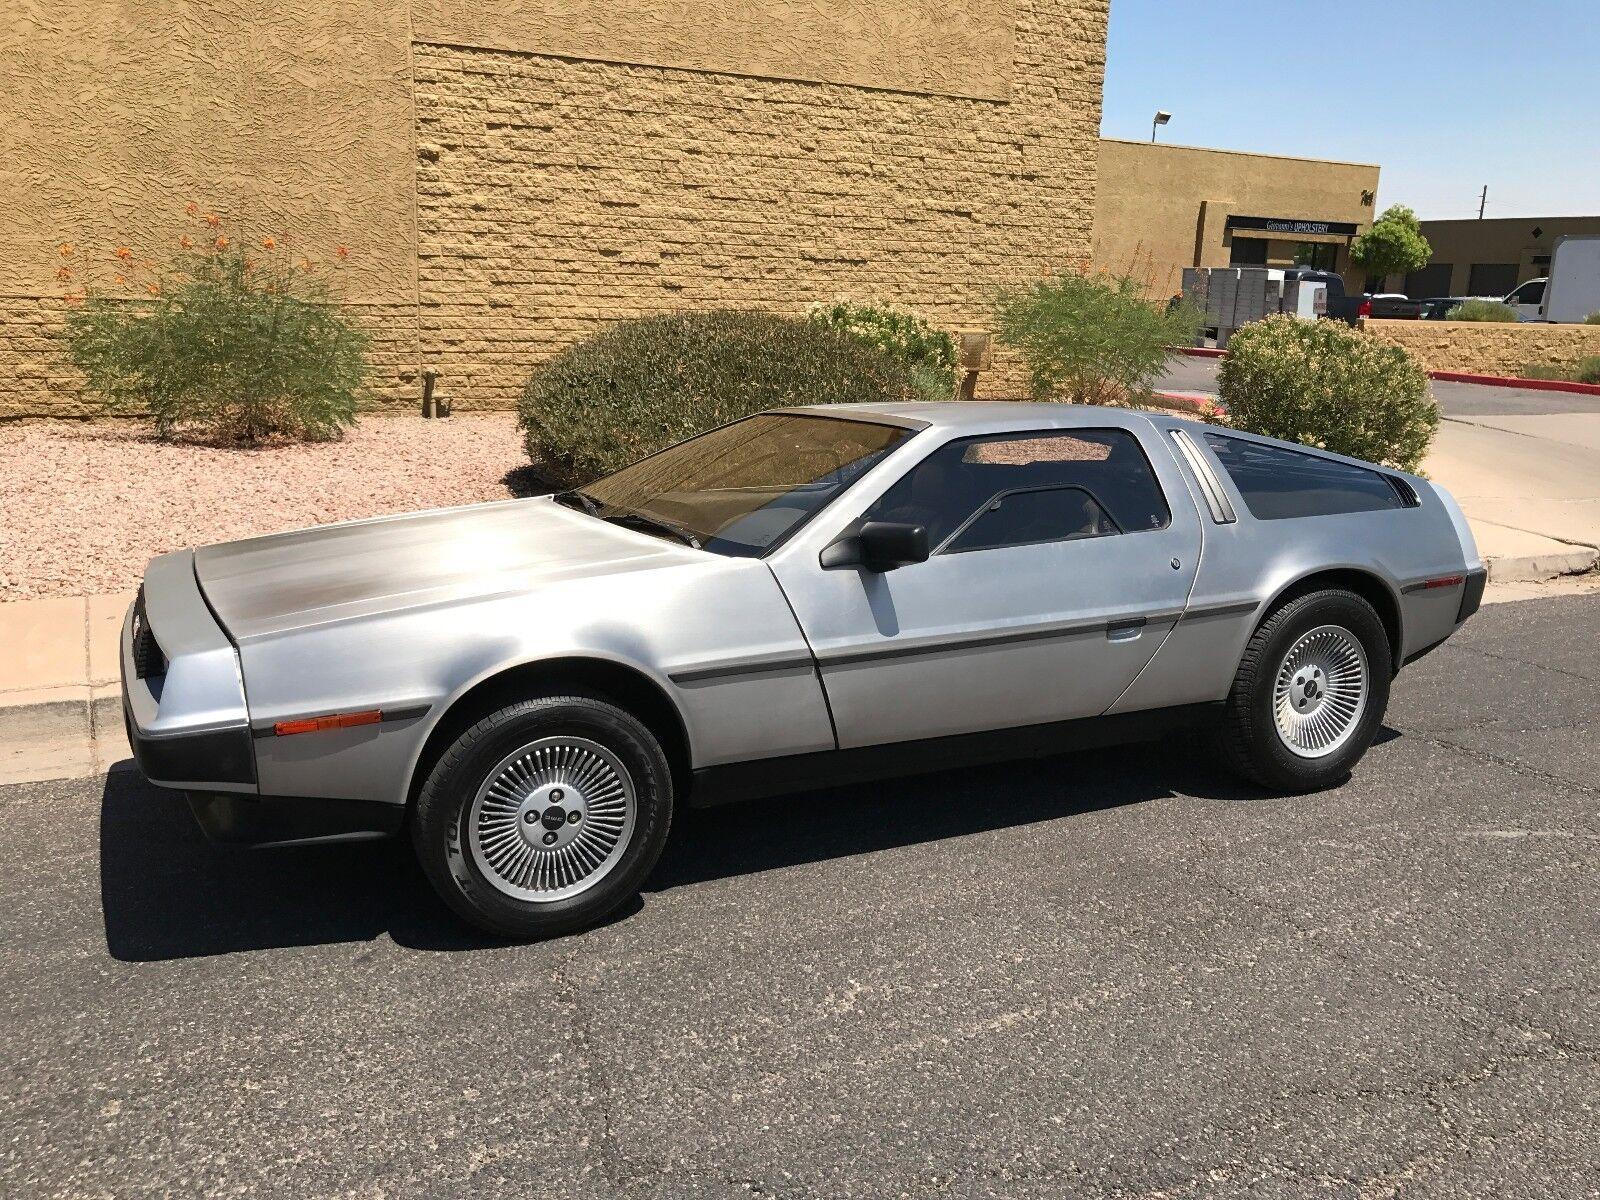 1981 DeLorean DMC-12  1 OWNER AZ CAR UNTIL 2015, 95% RESTORED!, 20K MILES!